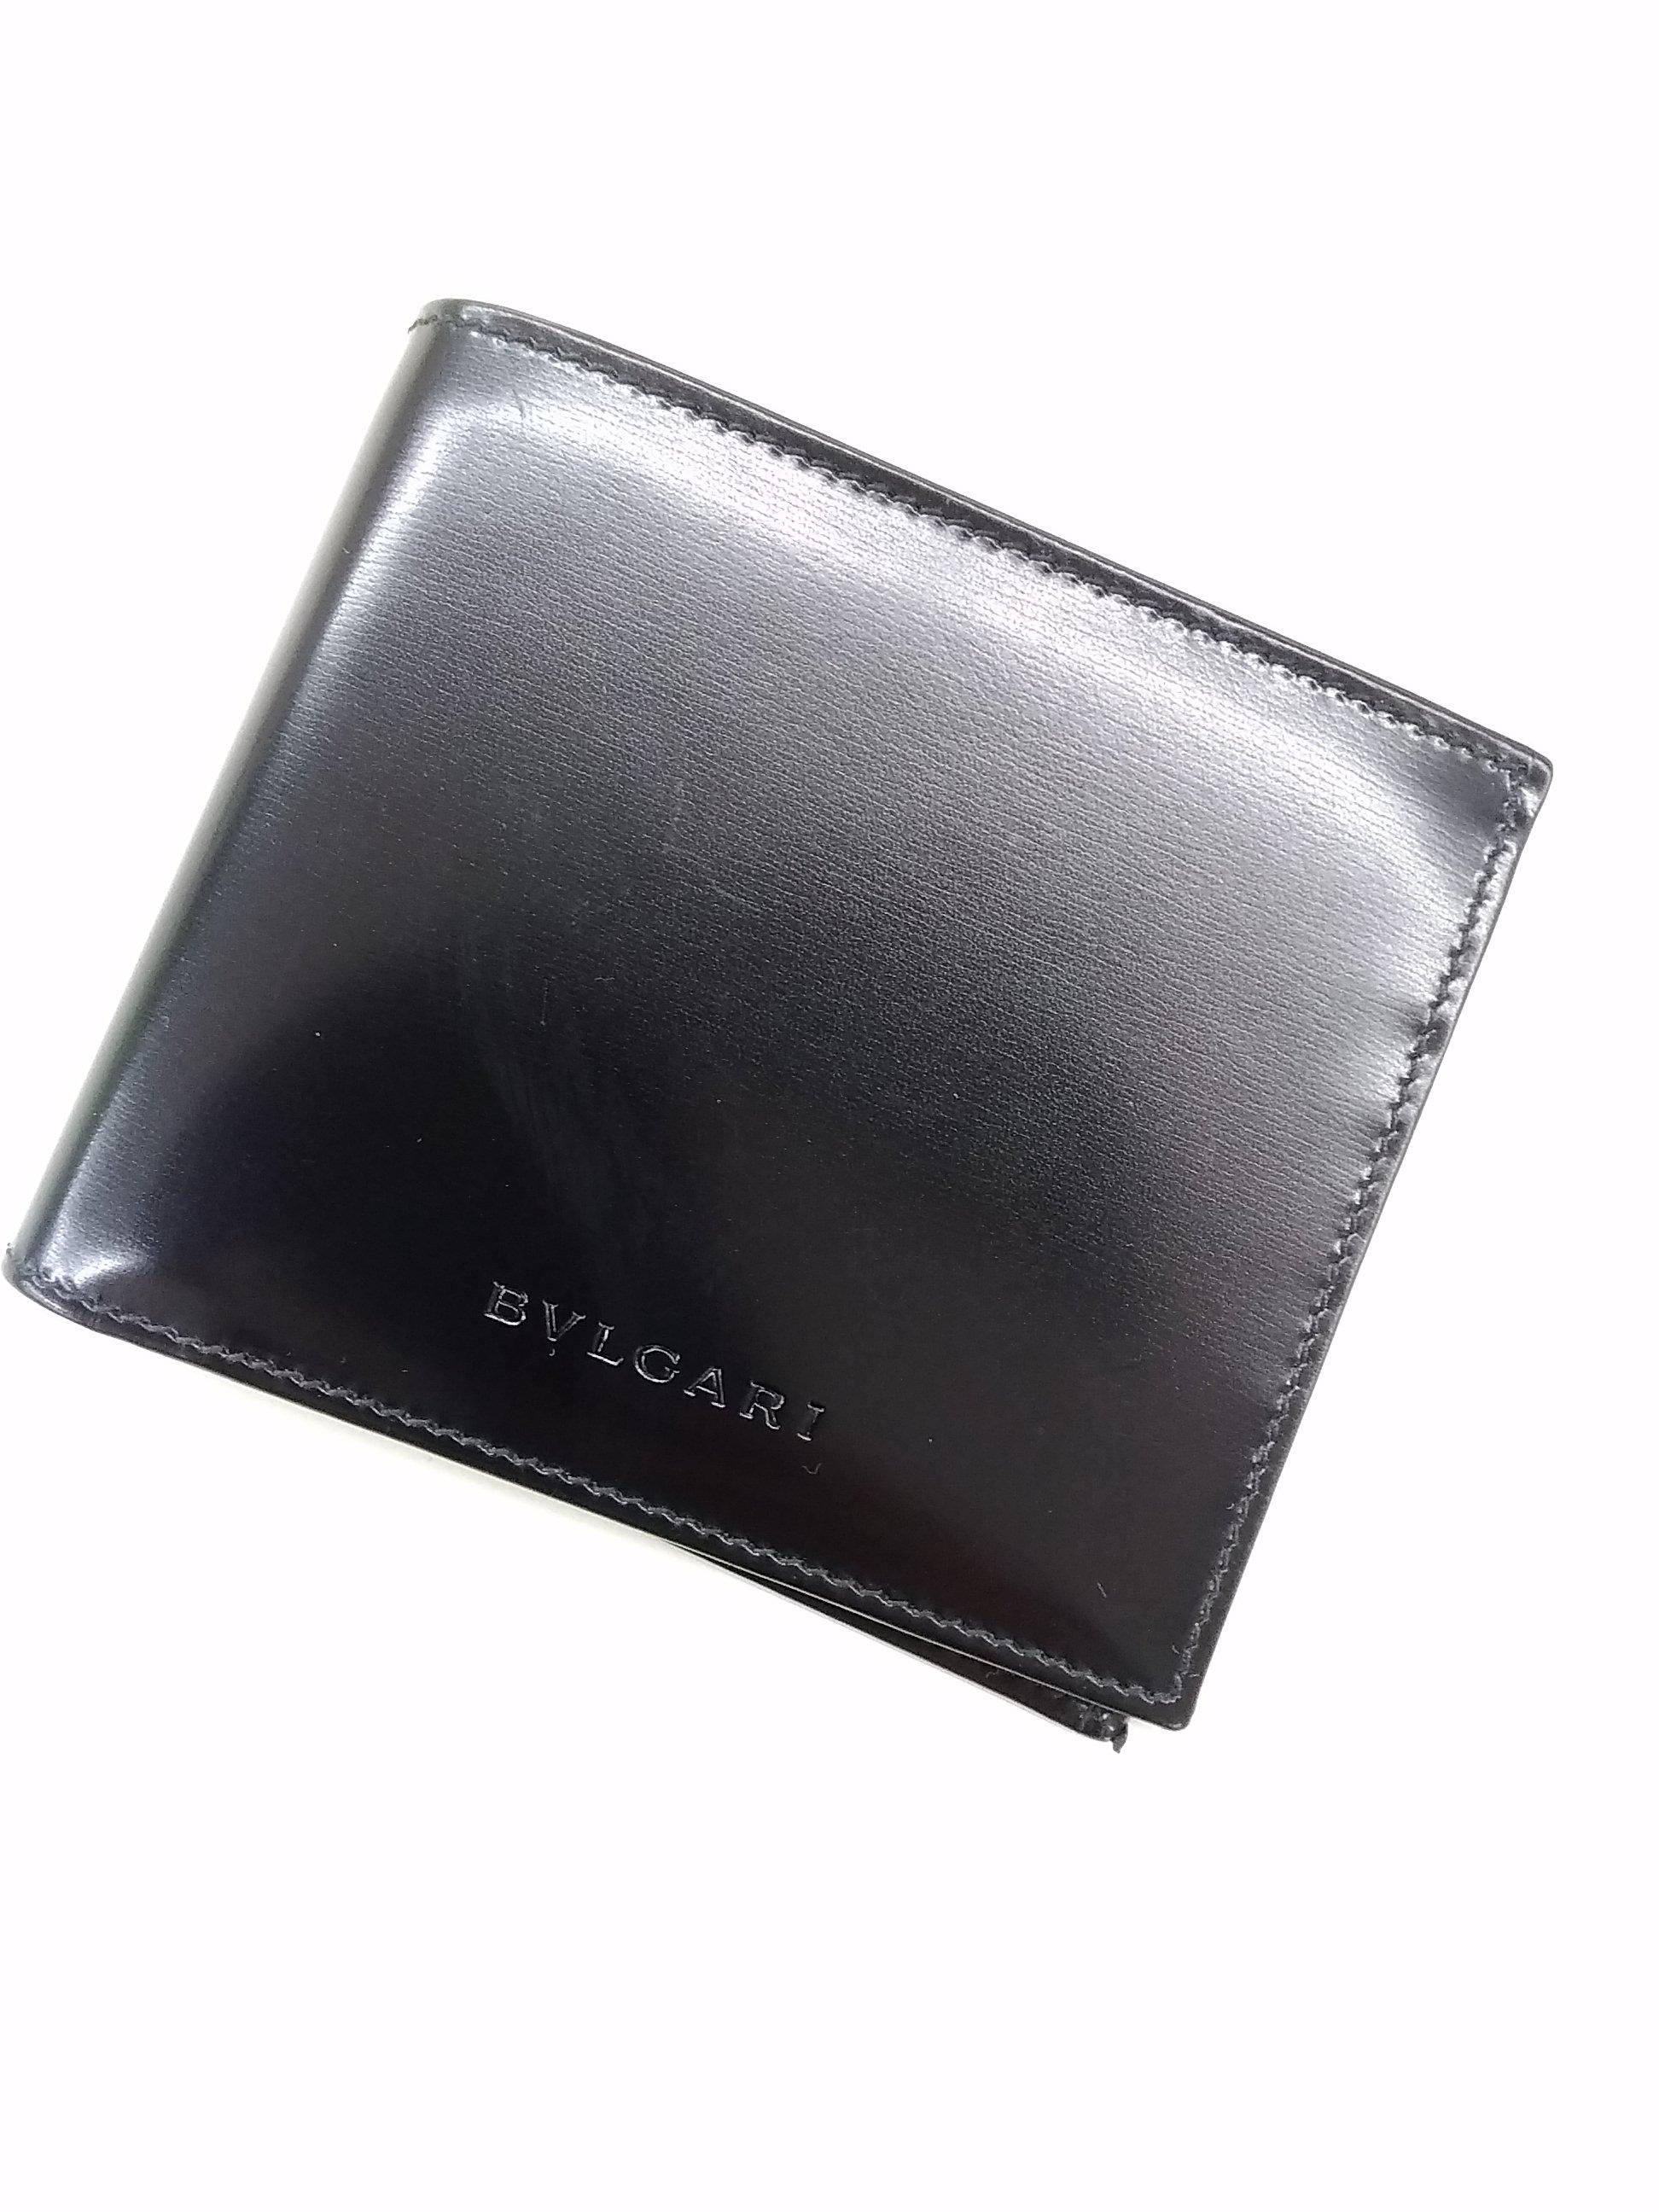 BVLGARI 二つ折り財布|BVLGARI